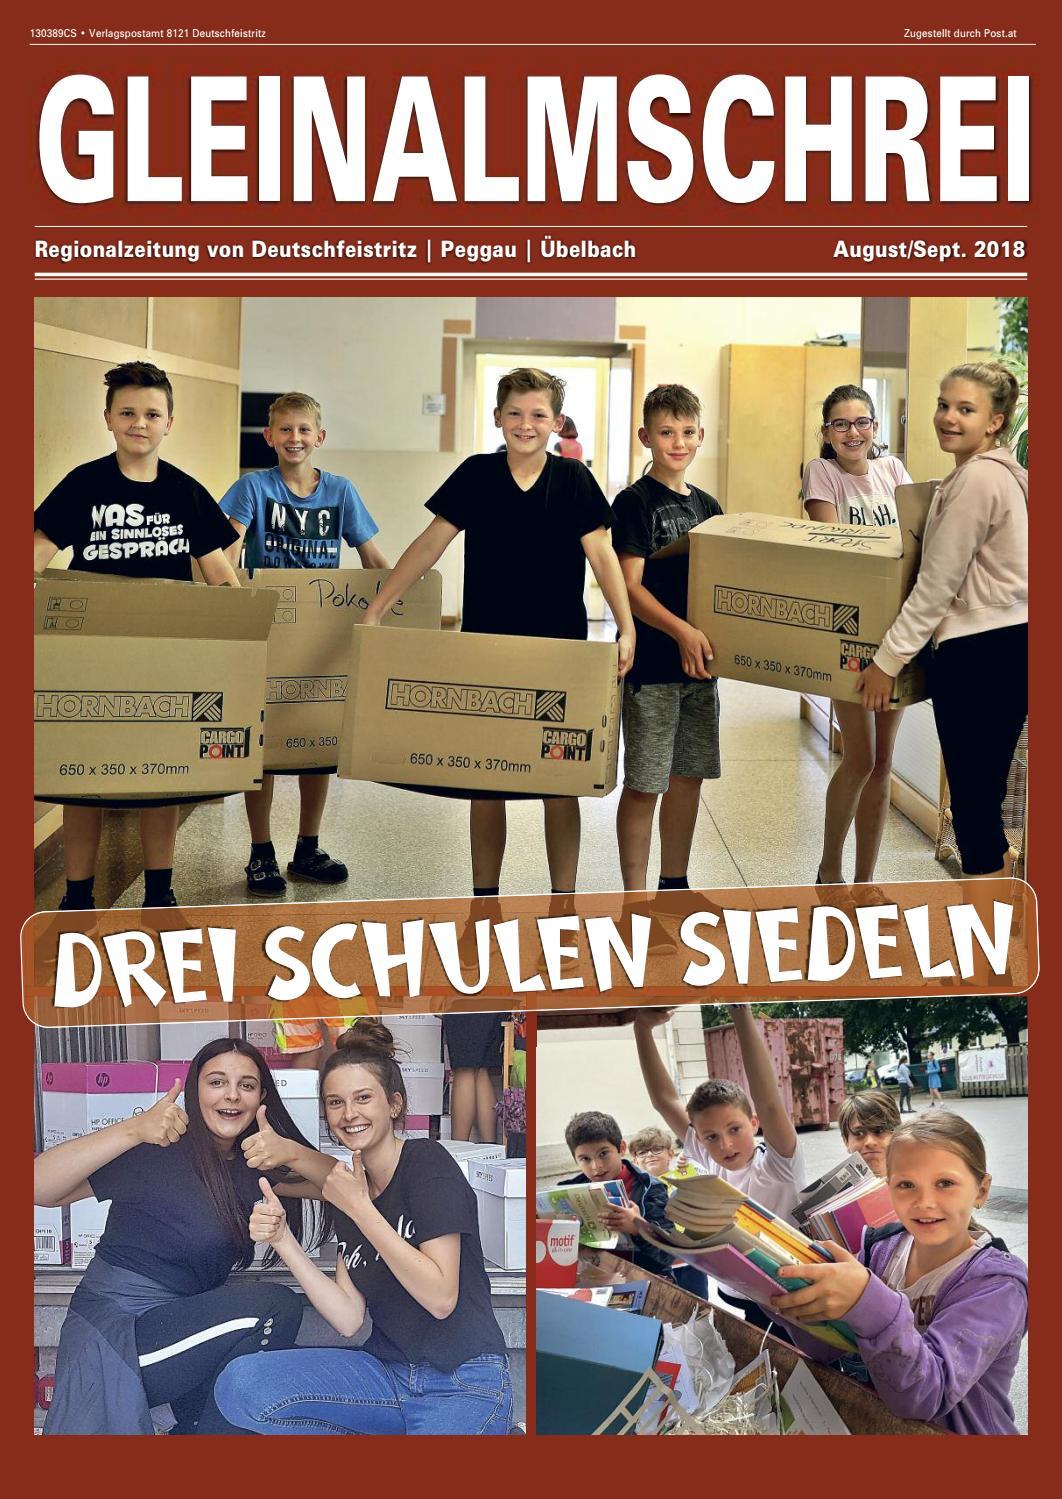 belbach singlebrsen kostenlos, Single kino aus eisenstadt